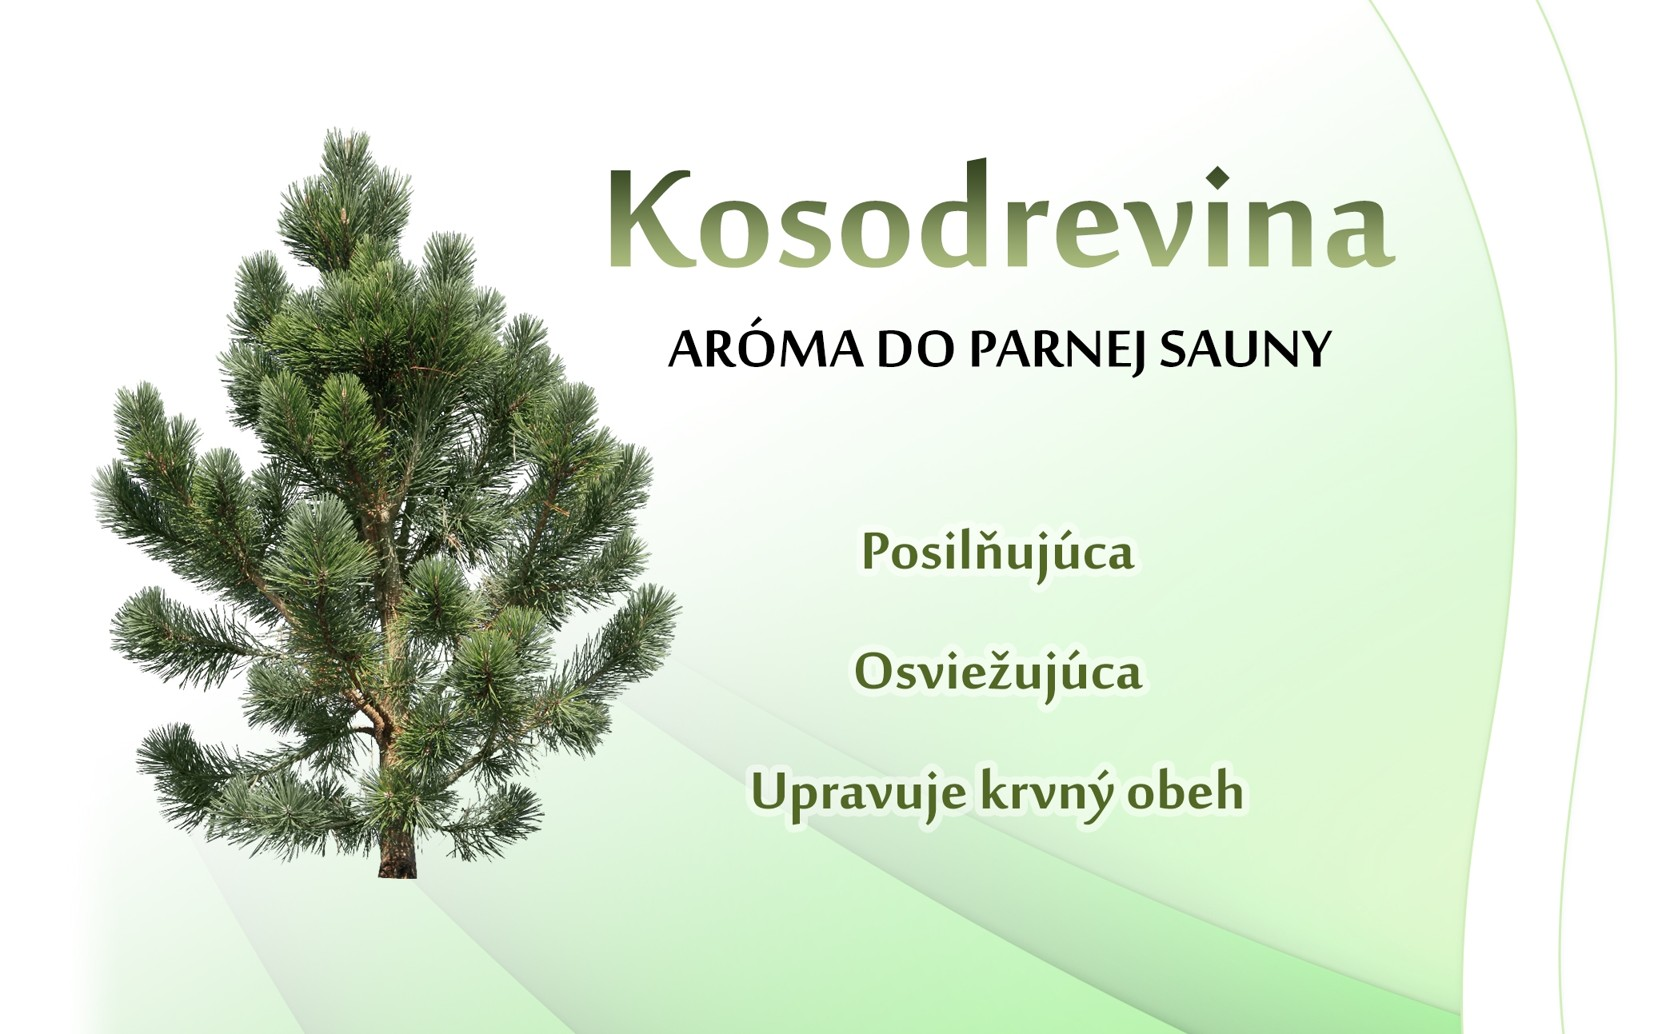 Kosodrevina - parná sauna